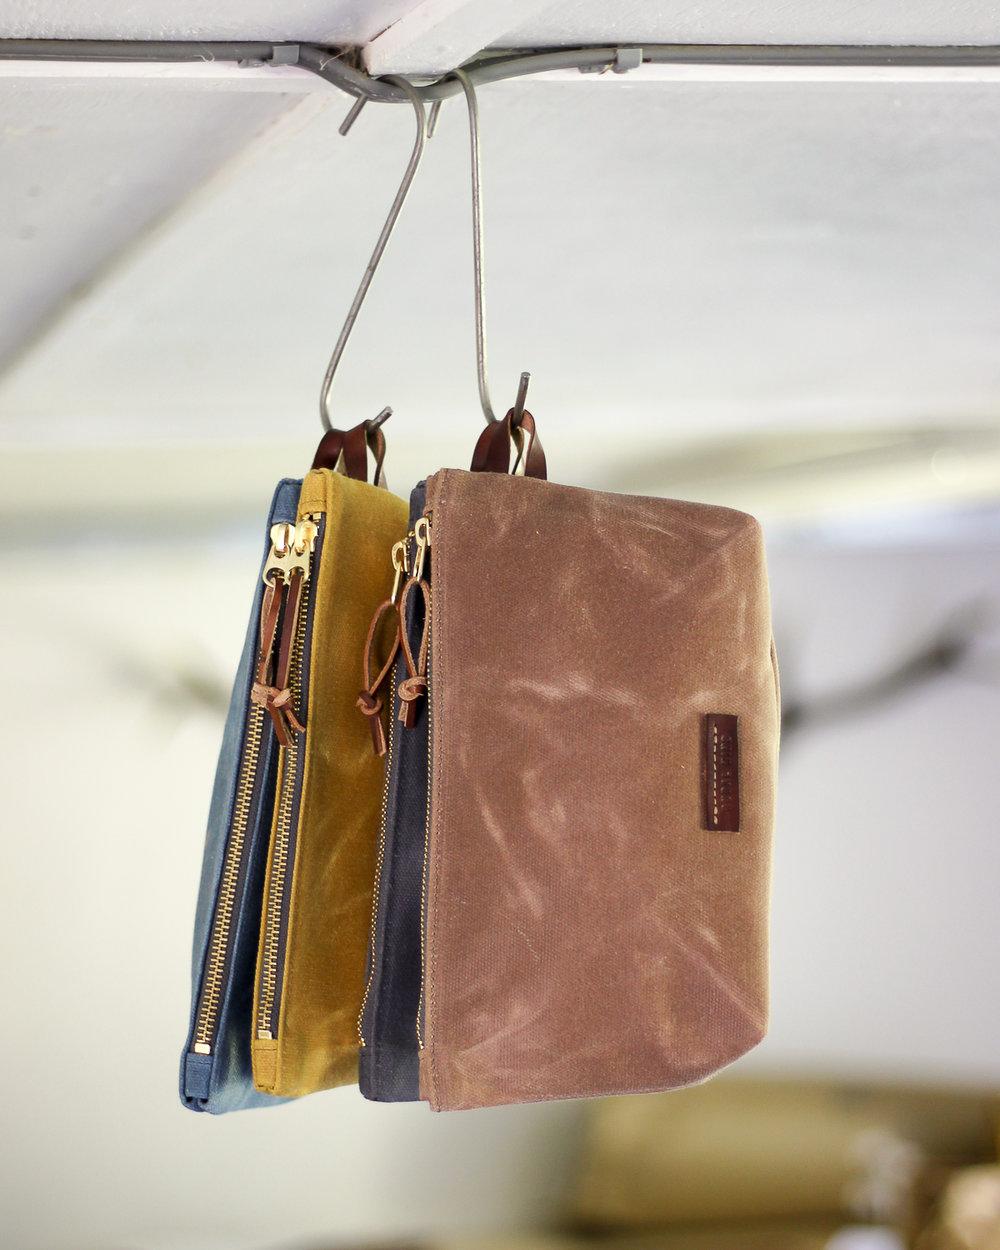 Rural-Kind-Handmade-Zip-Pouch-UK-103.jpg